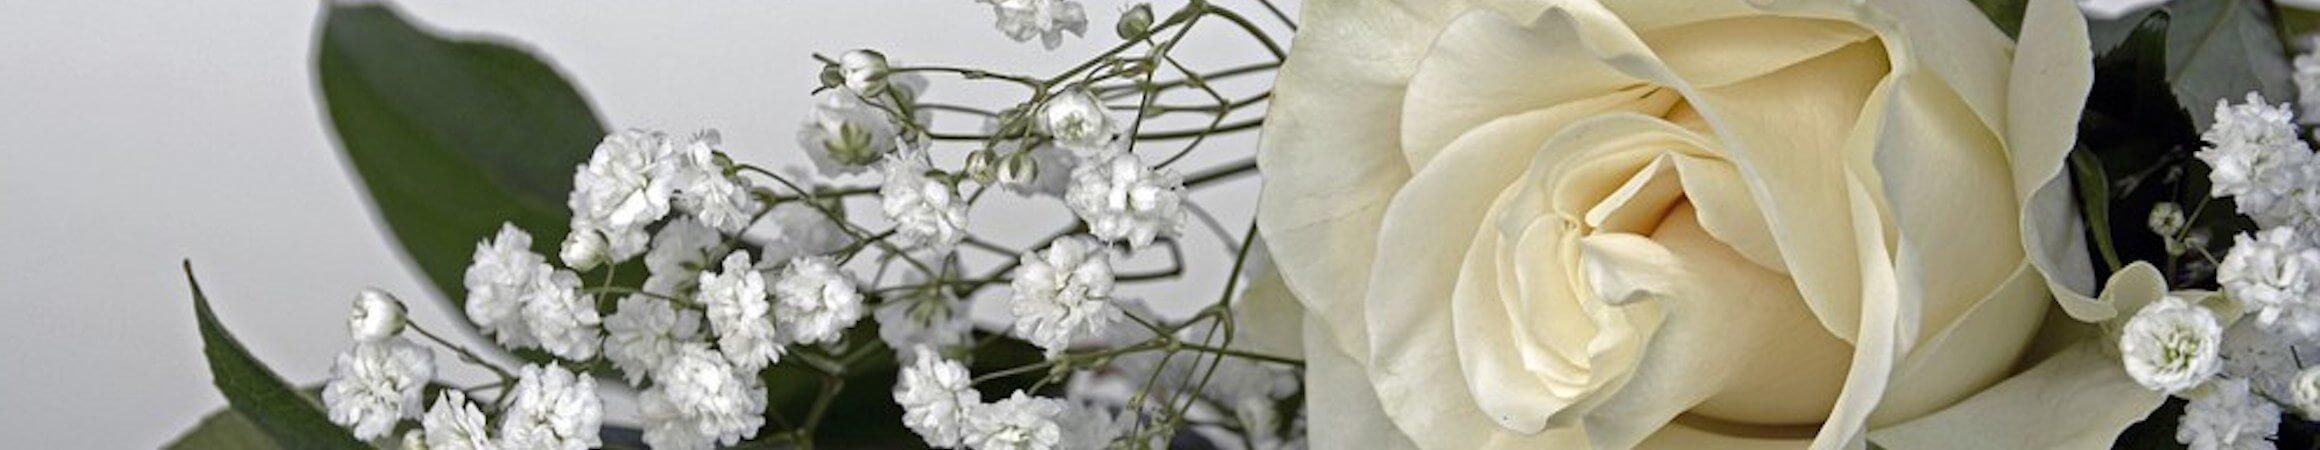 Roses 1420724  340